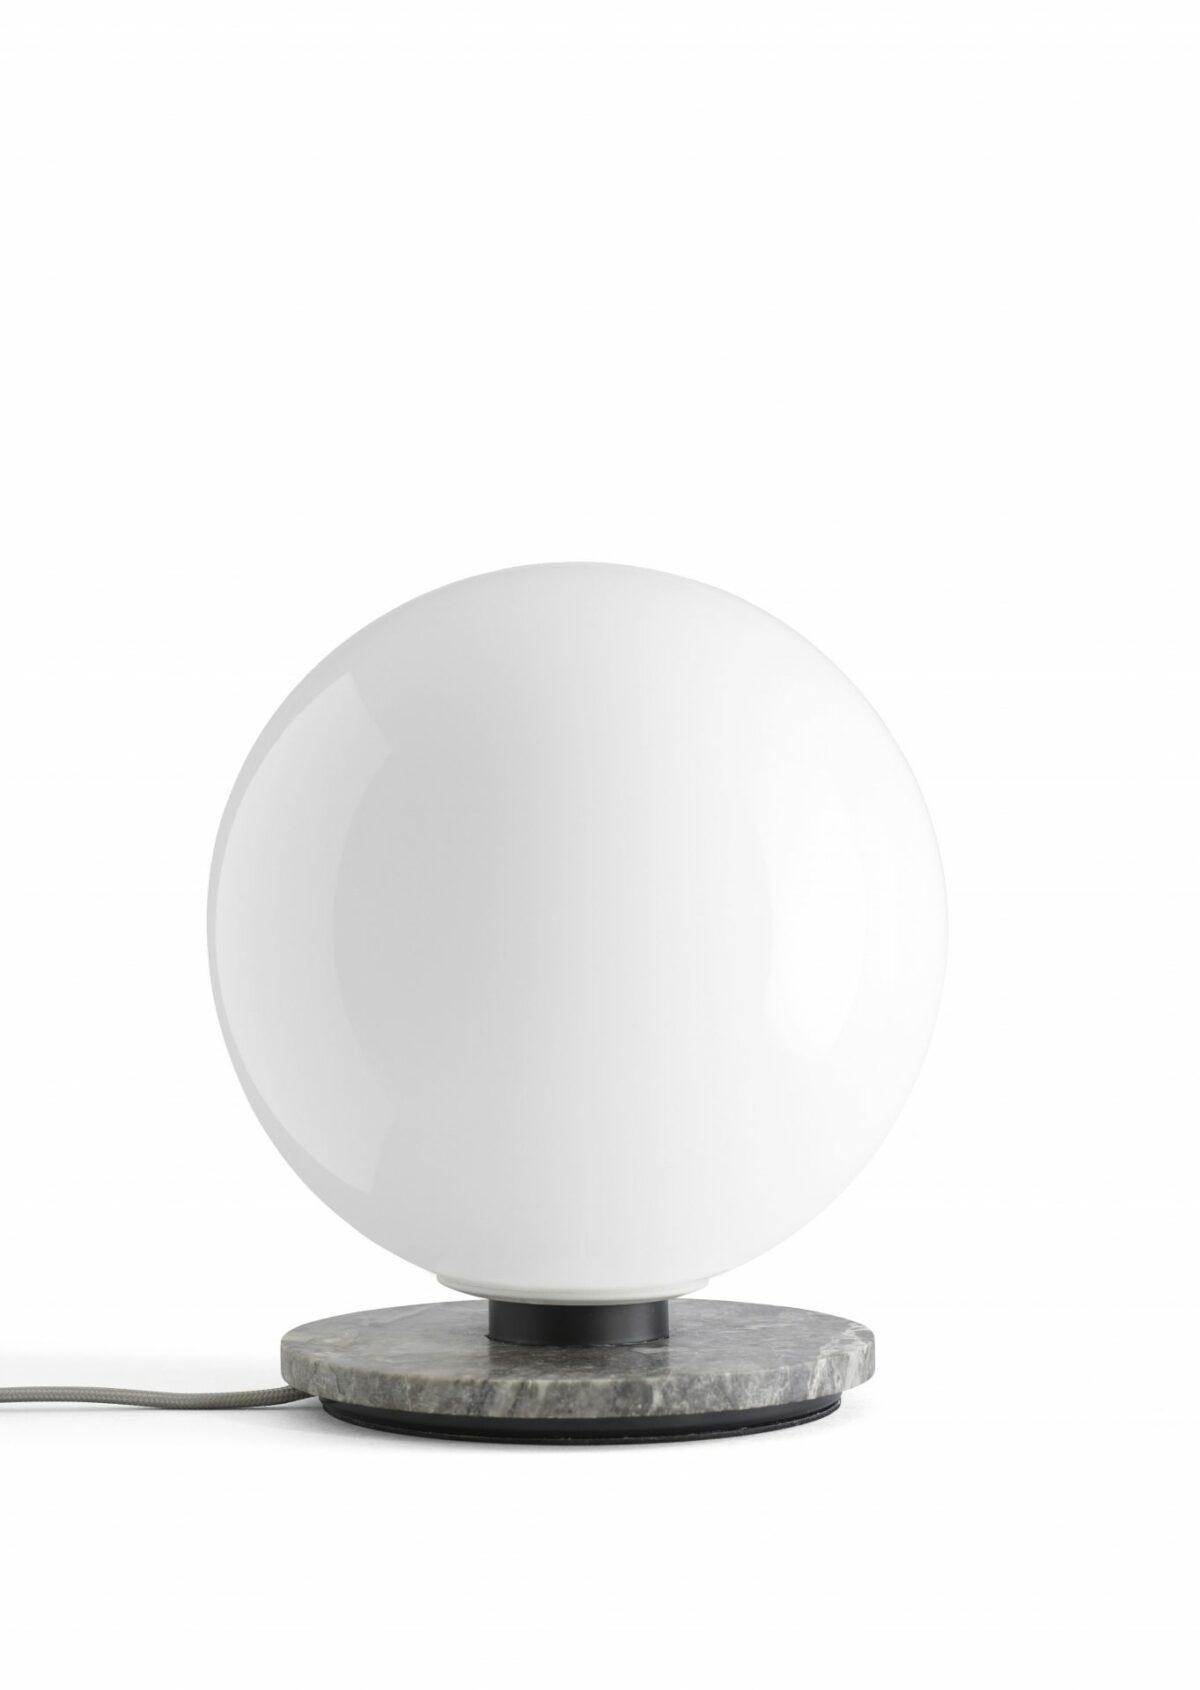 1492679 TR Bulb Shiny Opal Table Wall Lamp Marble DtW e1570715565252